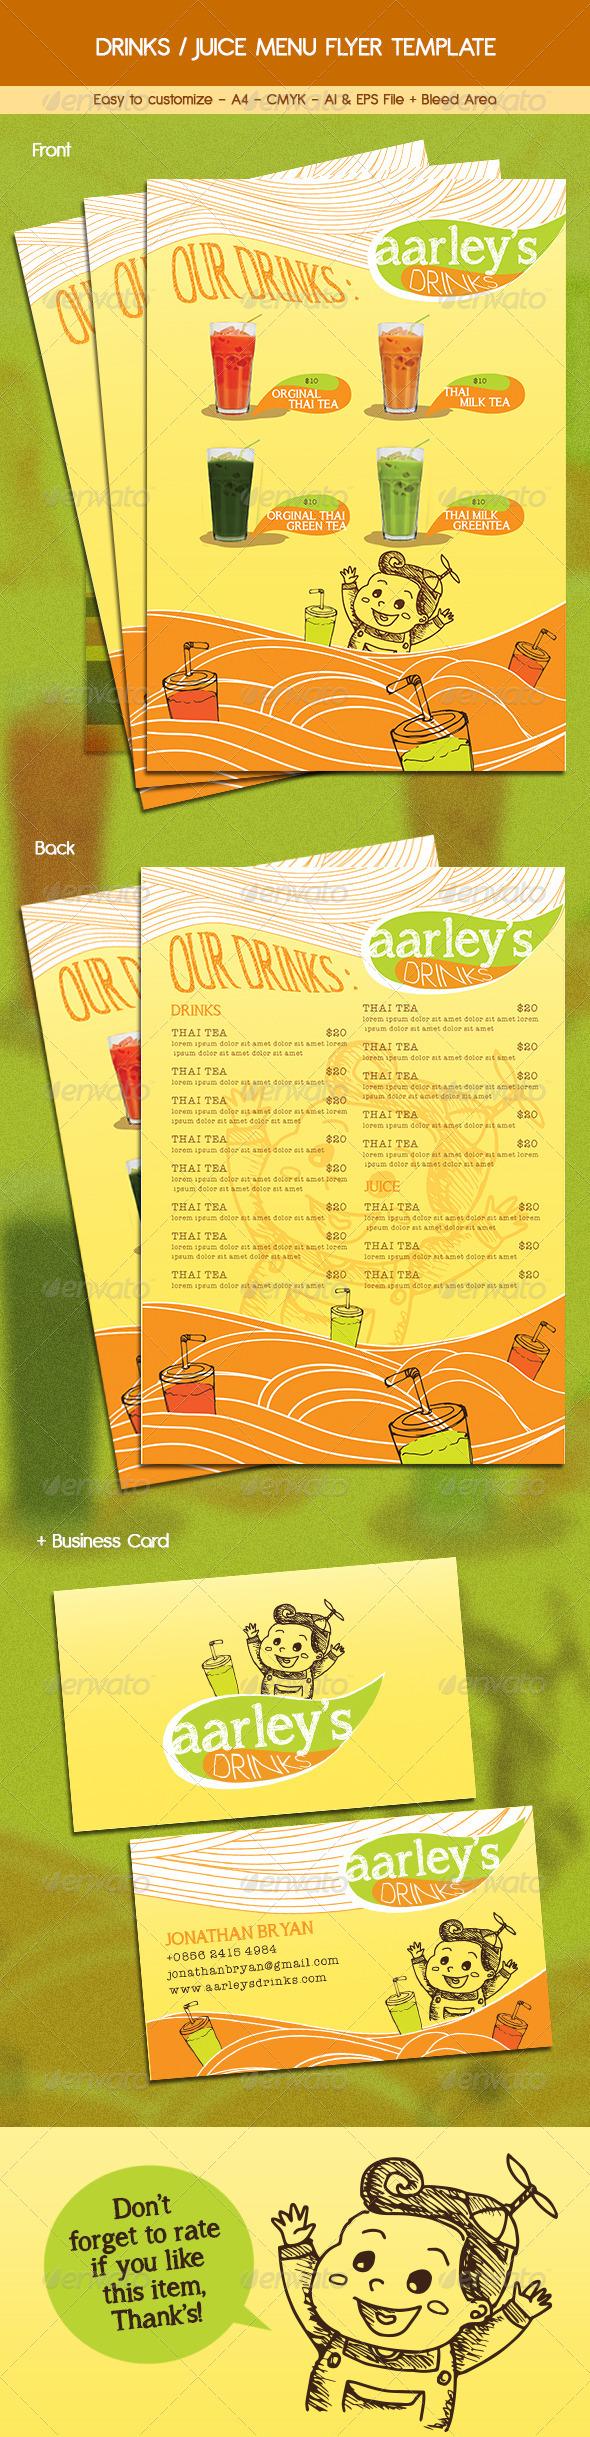 Drinks / Juice Menu Flyer - Food Menus Print Templates